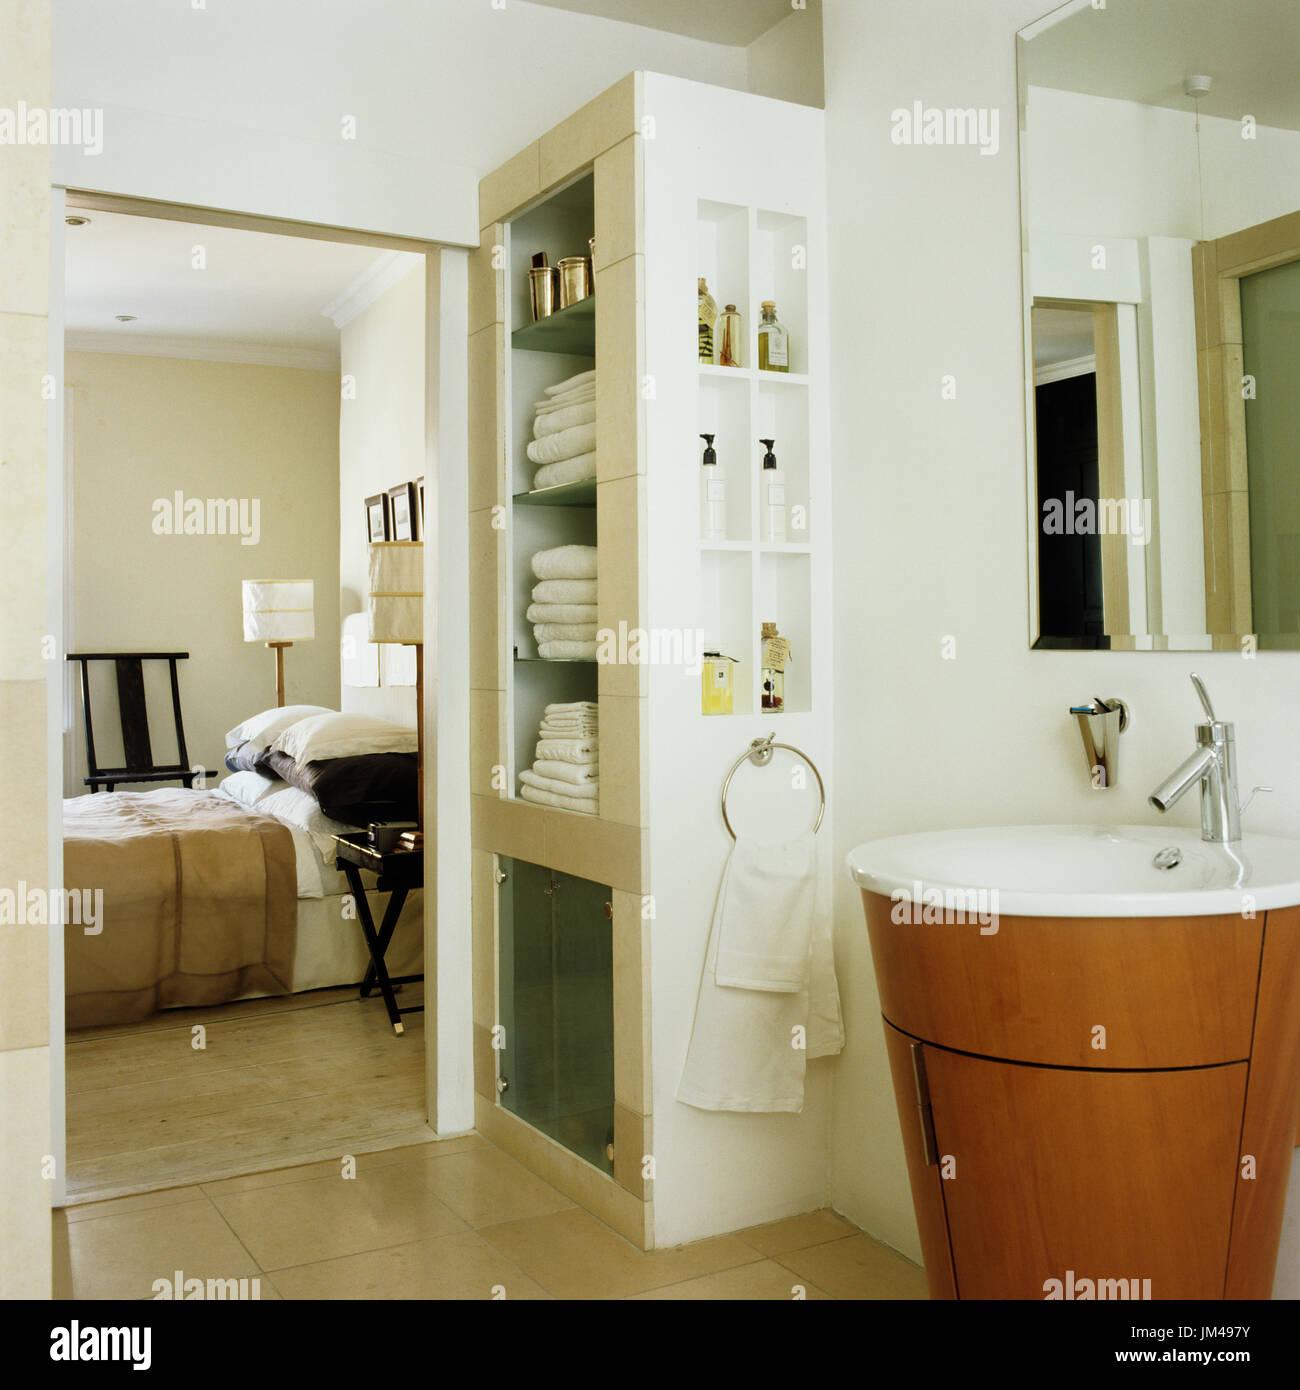 Ensuite bathroom - Stock Image